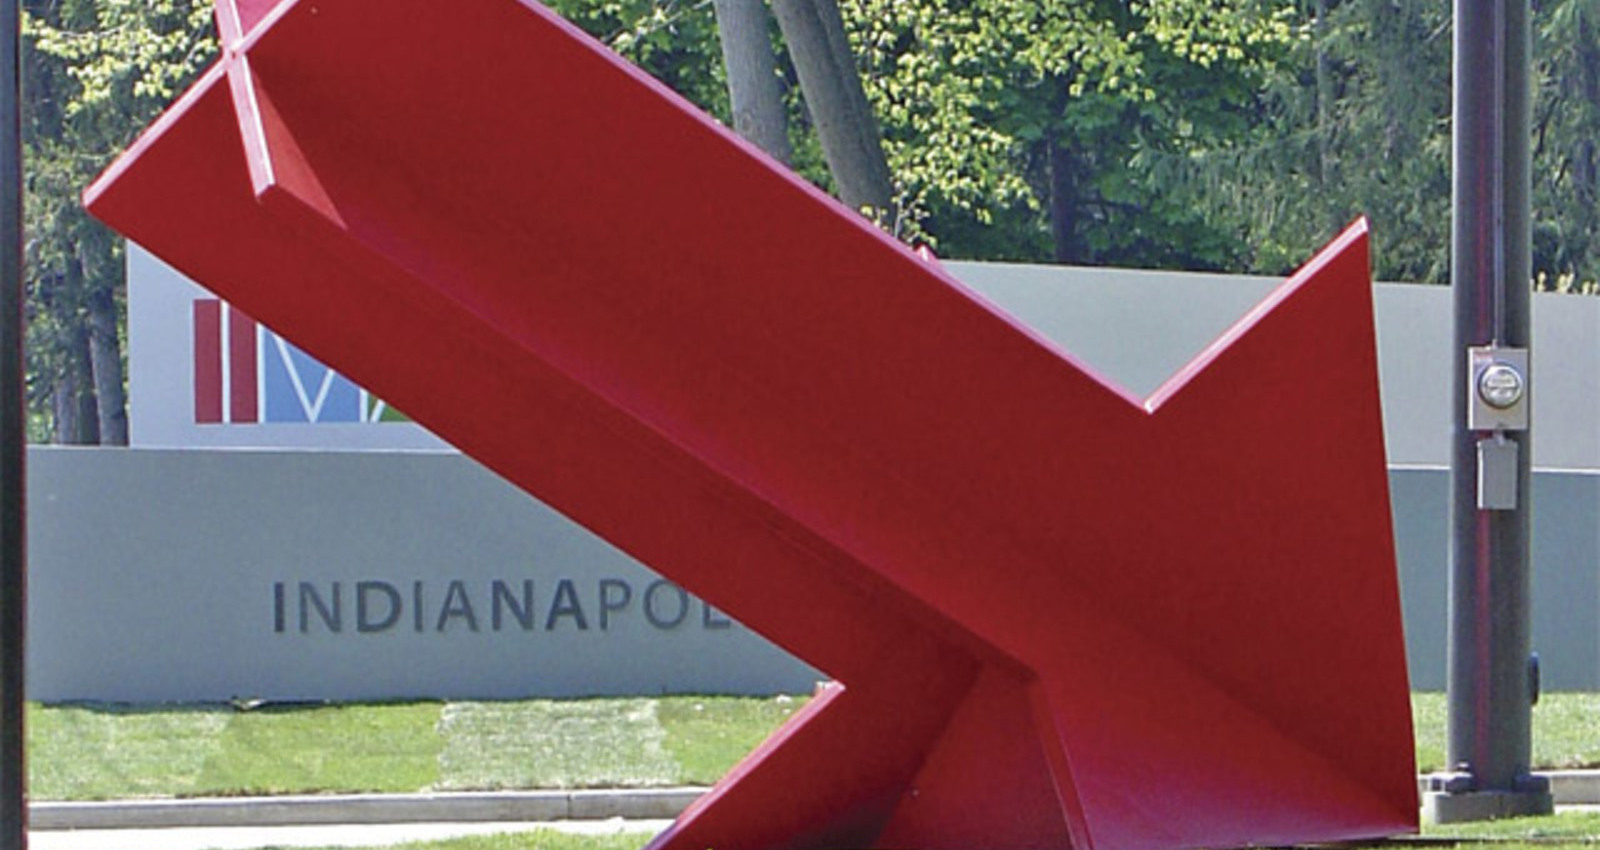 Big Red Arrow